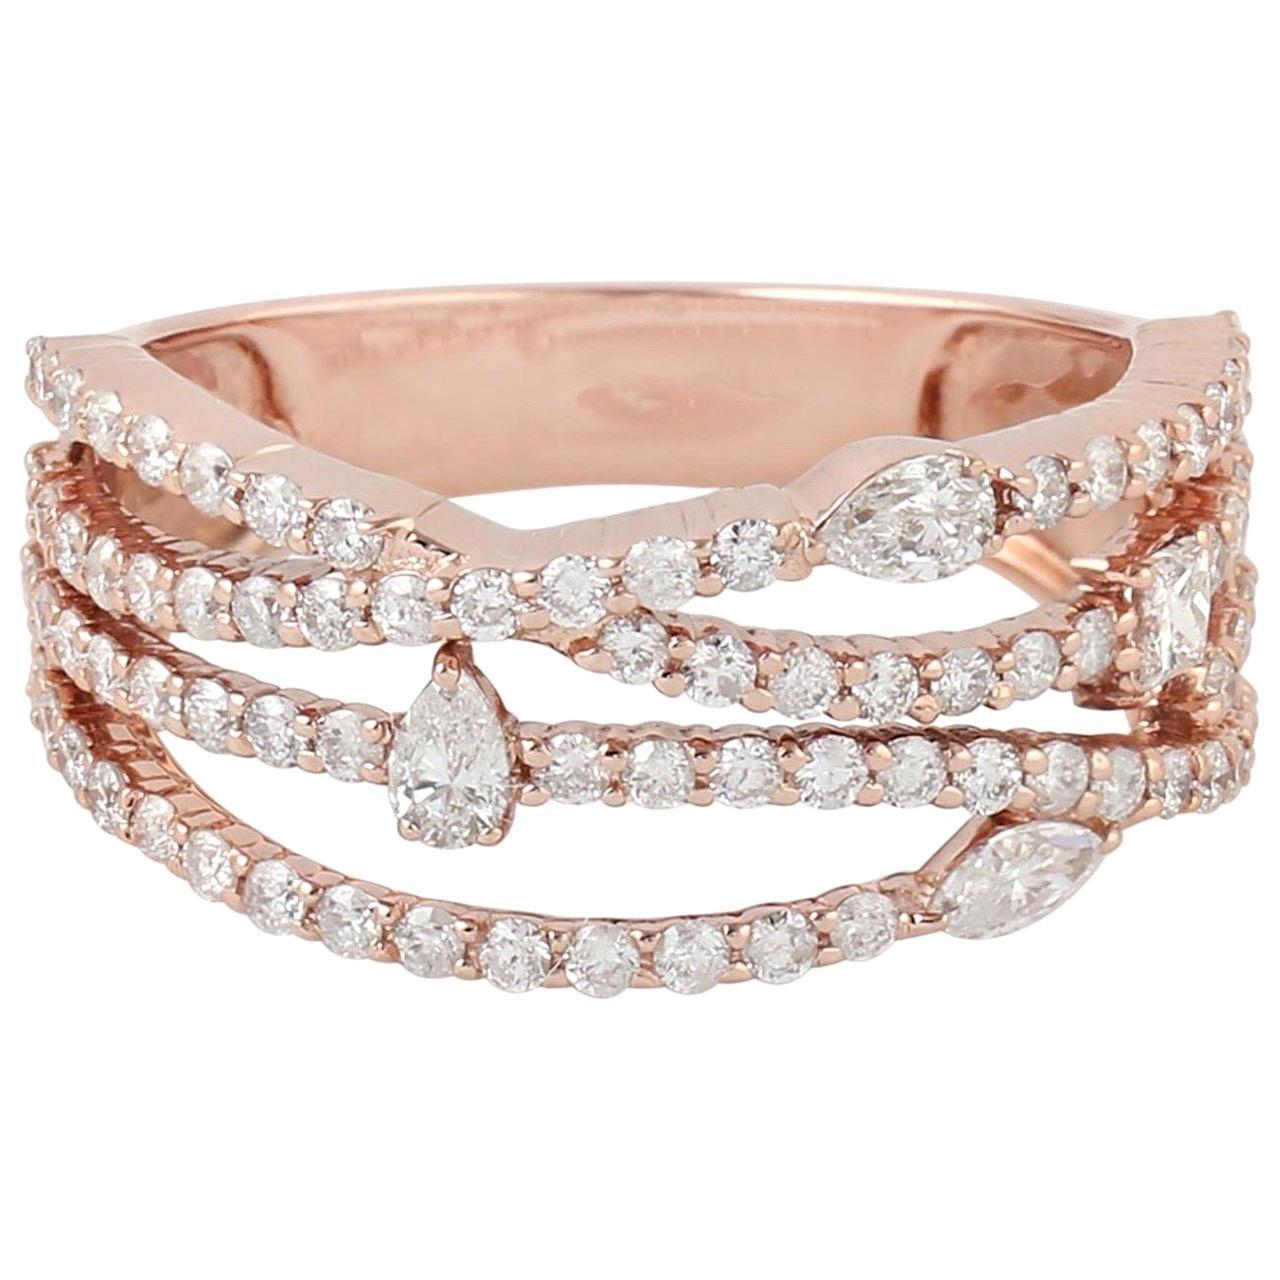 Intertwined 18 Karat Gold Diamond Engagement Ring